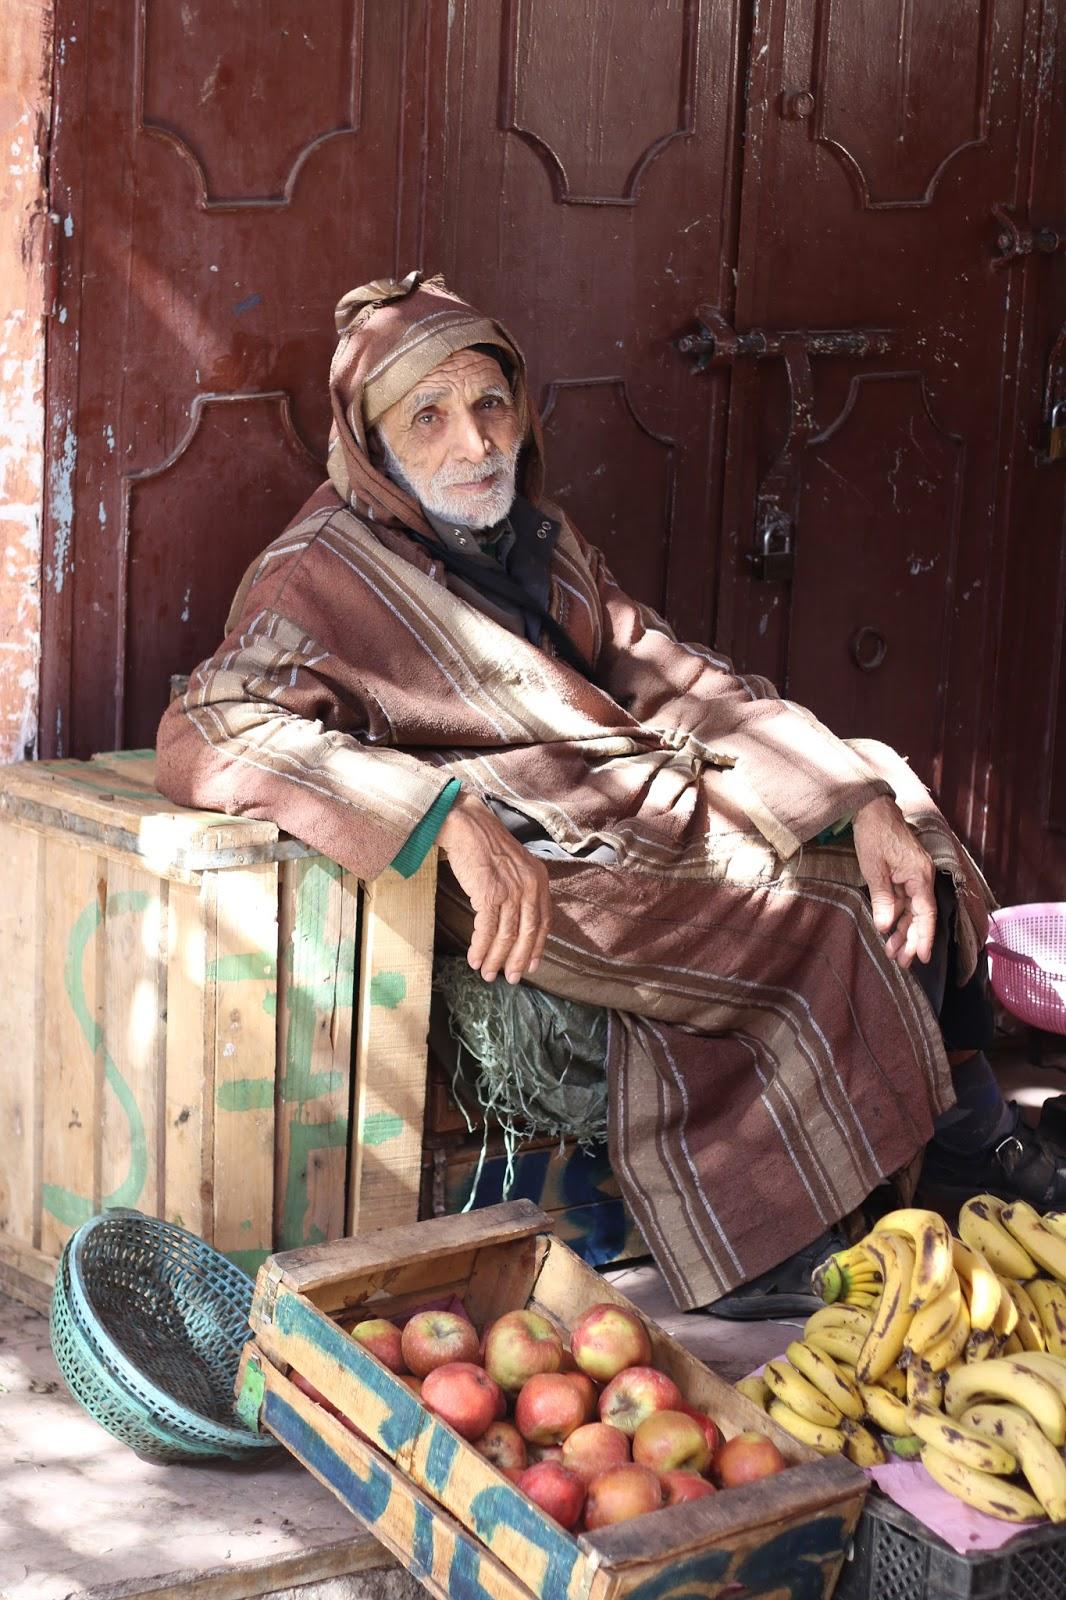 Travel: Revisiting Marrakech